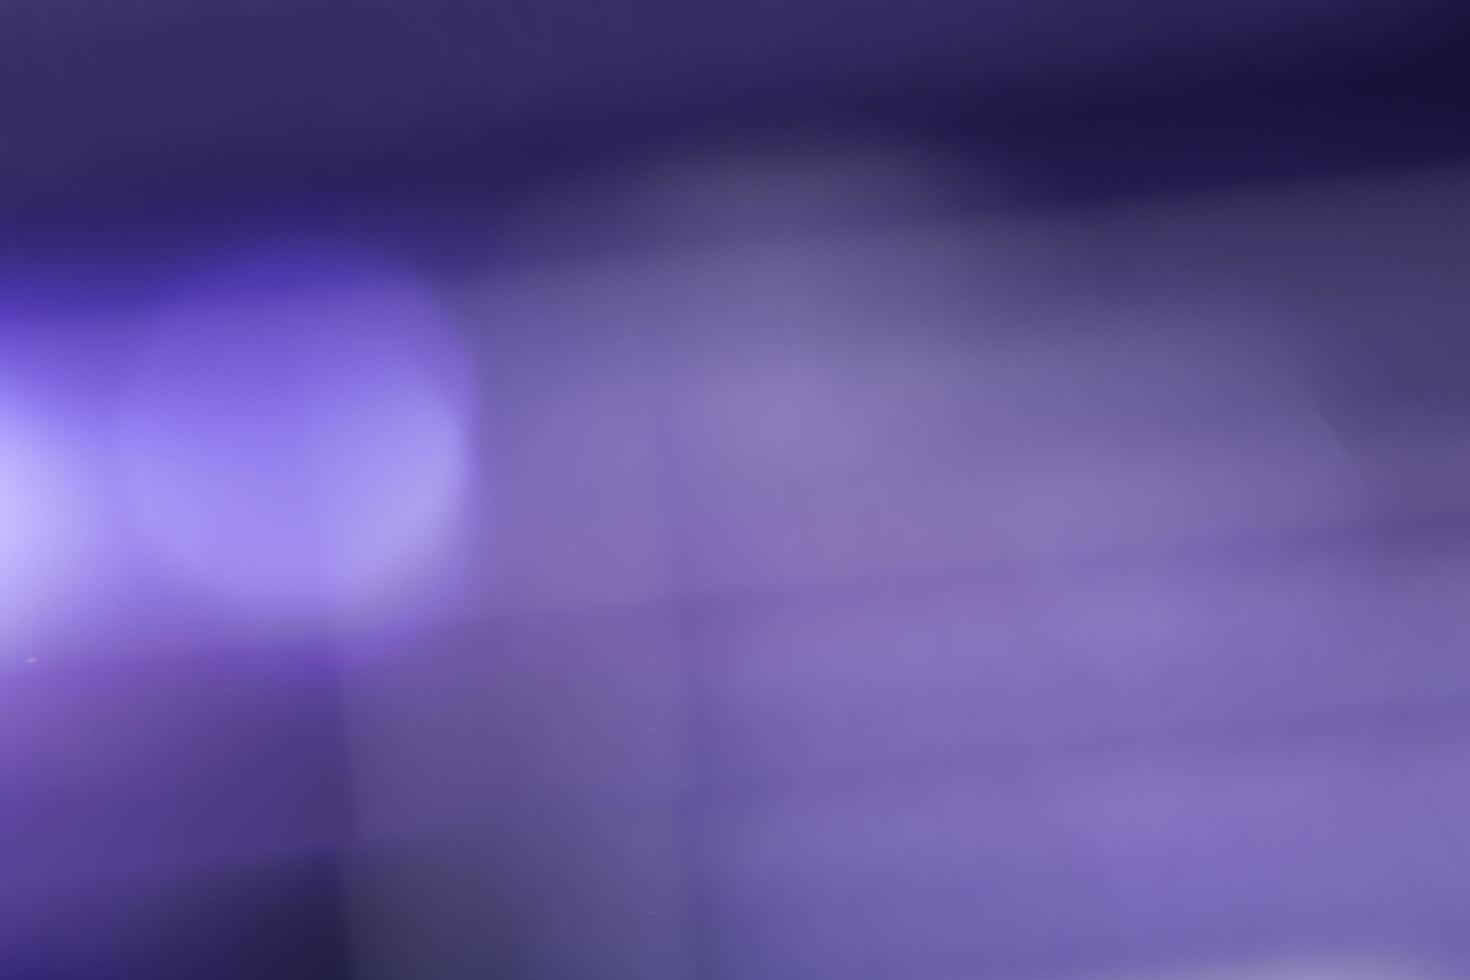 sfondo viola bokeh foto